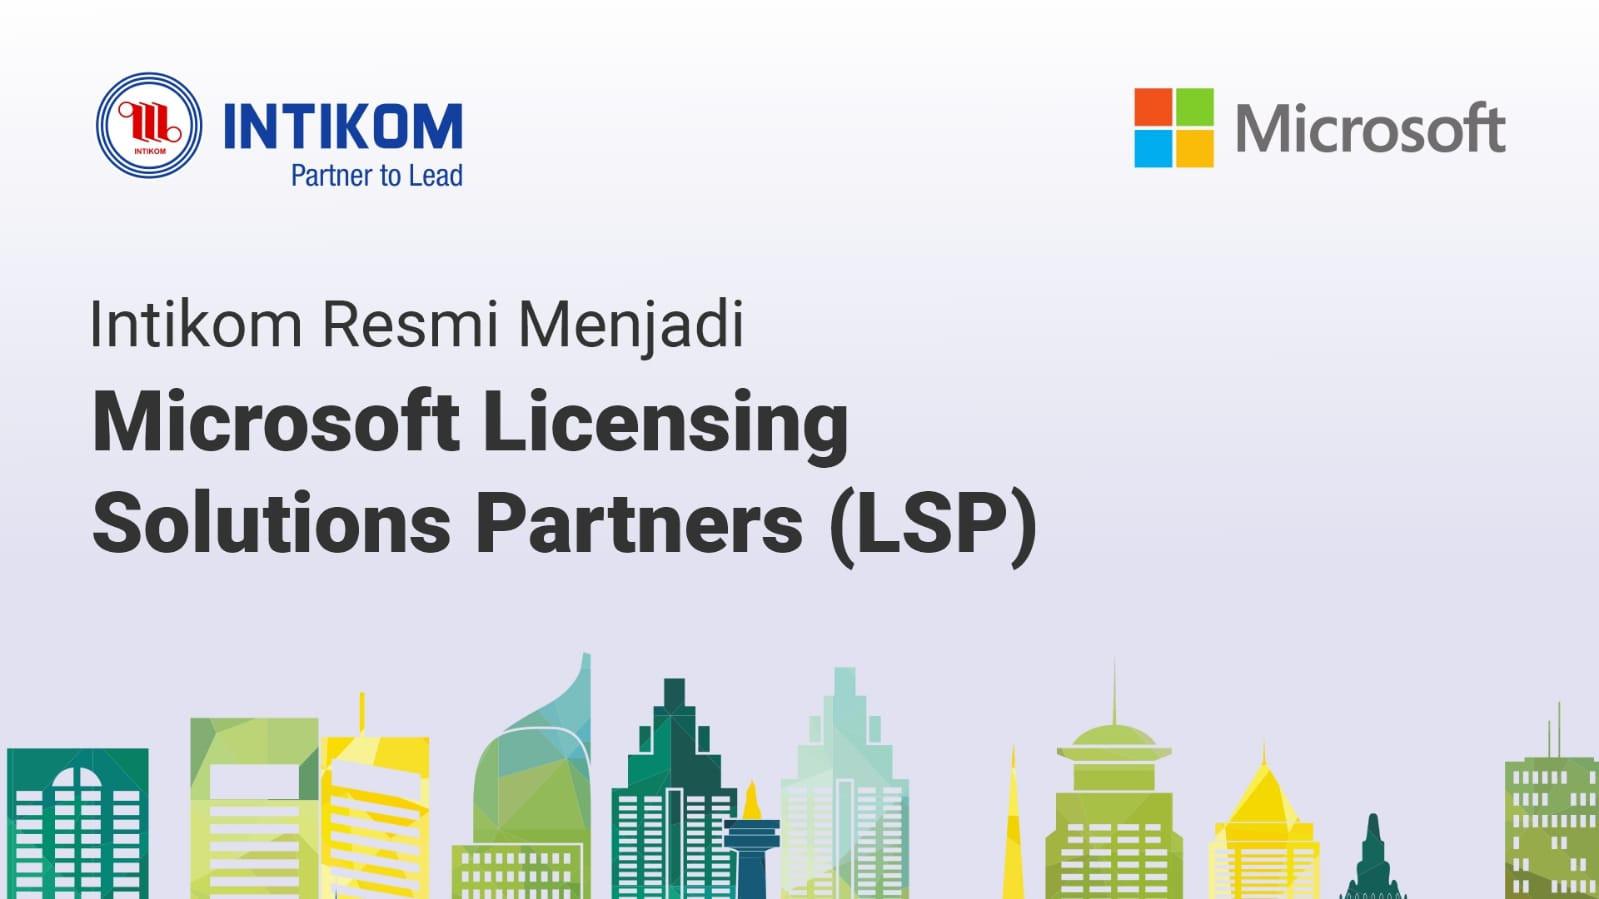 Intikom Kini Resmi Jadi Microsoft LSP